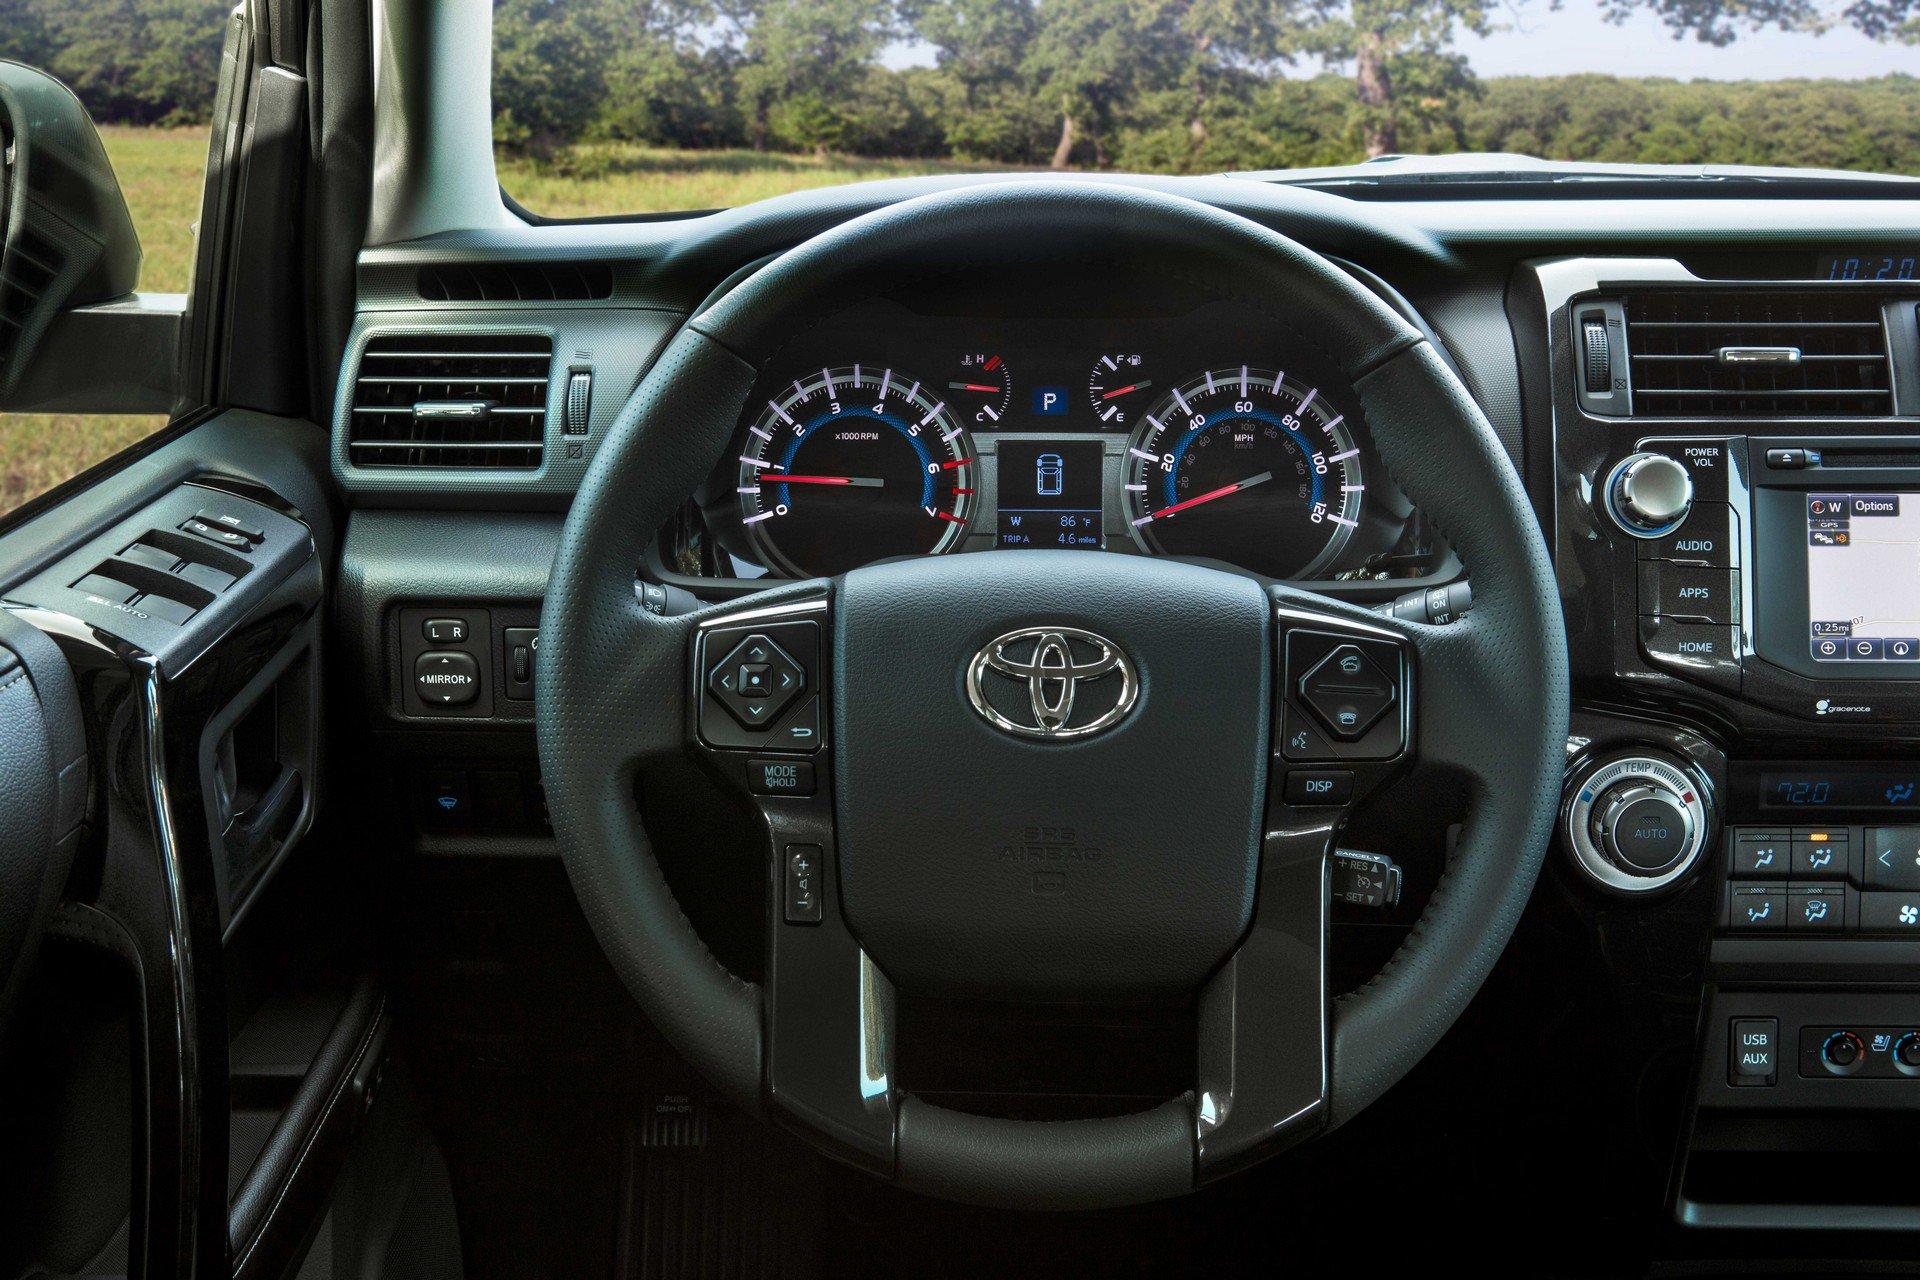 Toyota Won't Recall GX 460, Stops Sales Worldwide - autoevolution